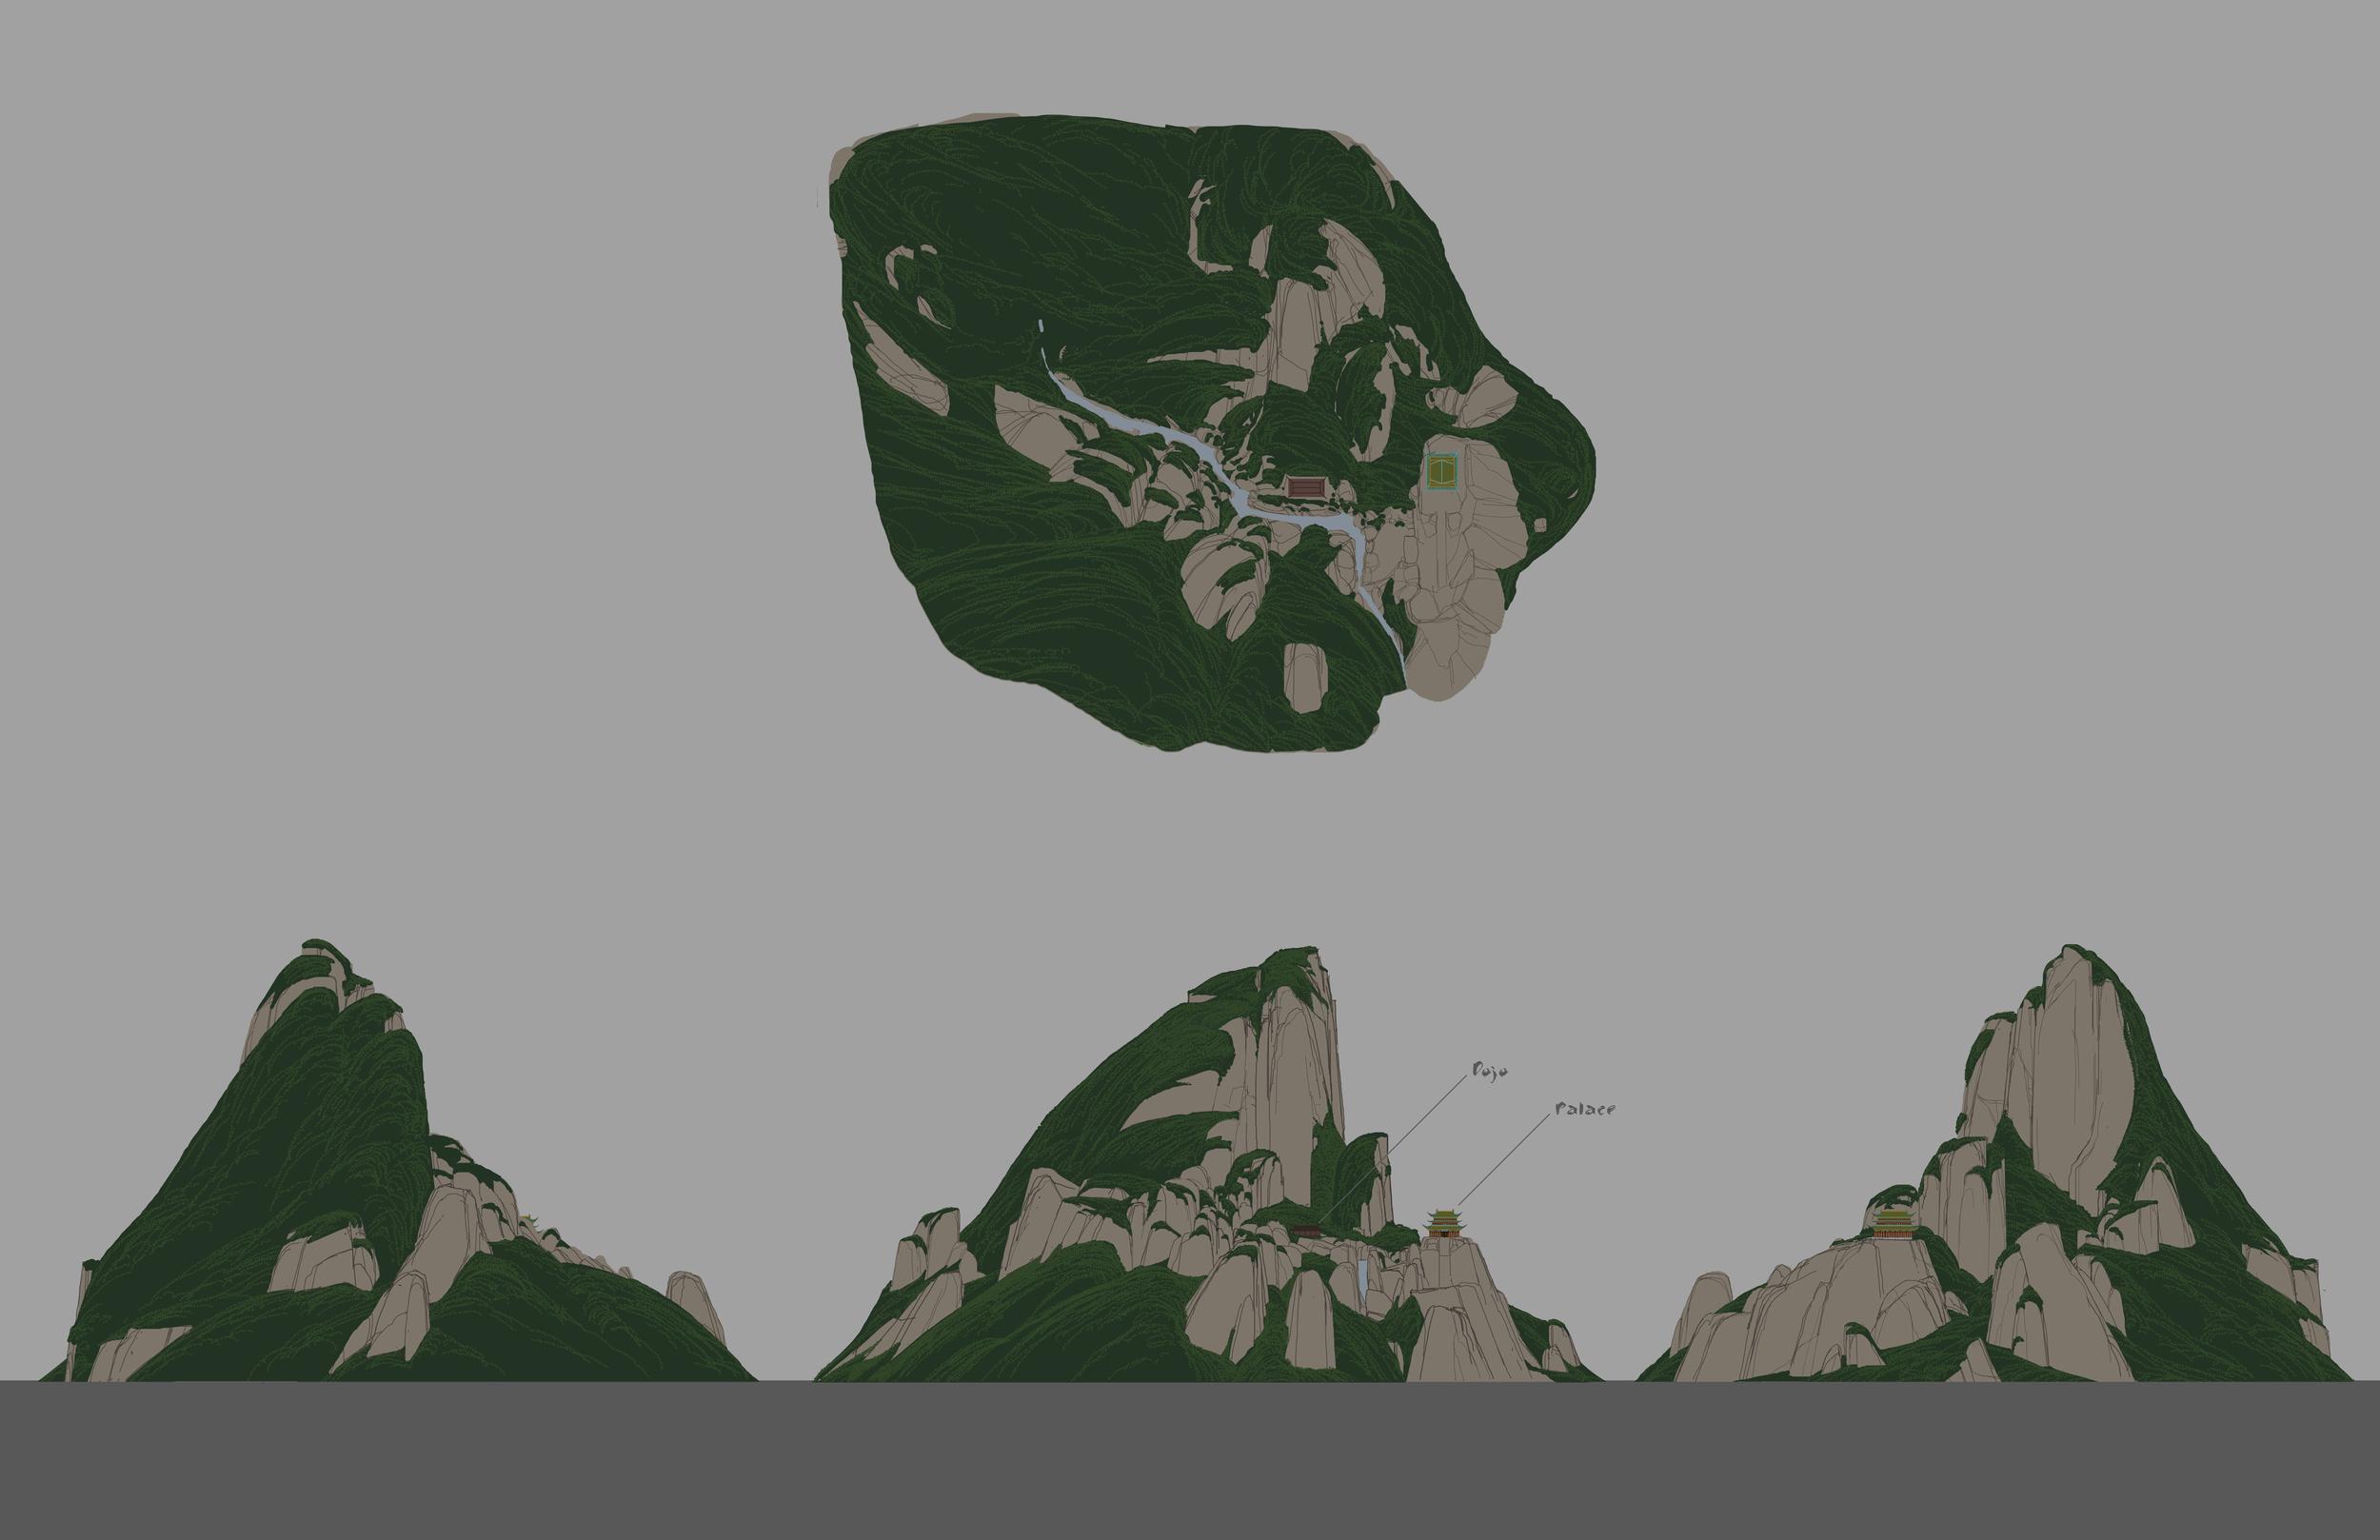 Kung Fu Panda, DWA Jade Mountain design - Orthographic view